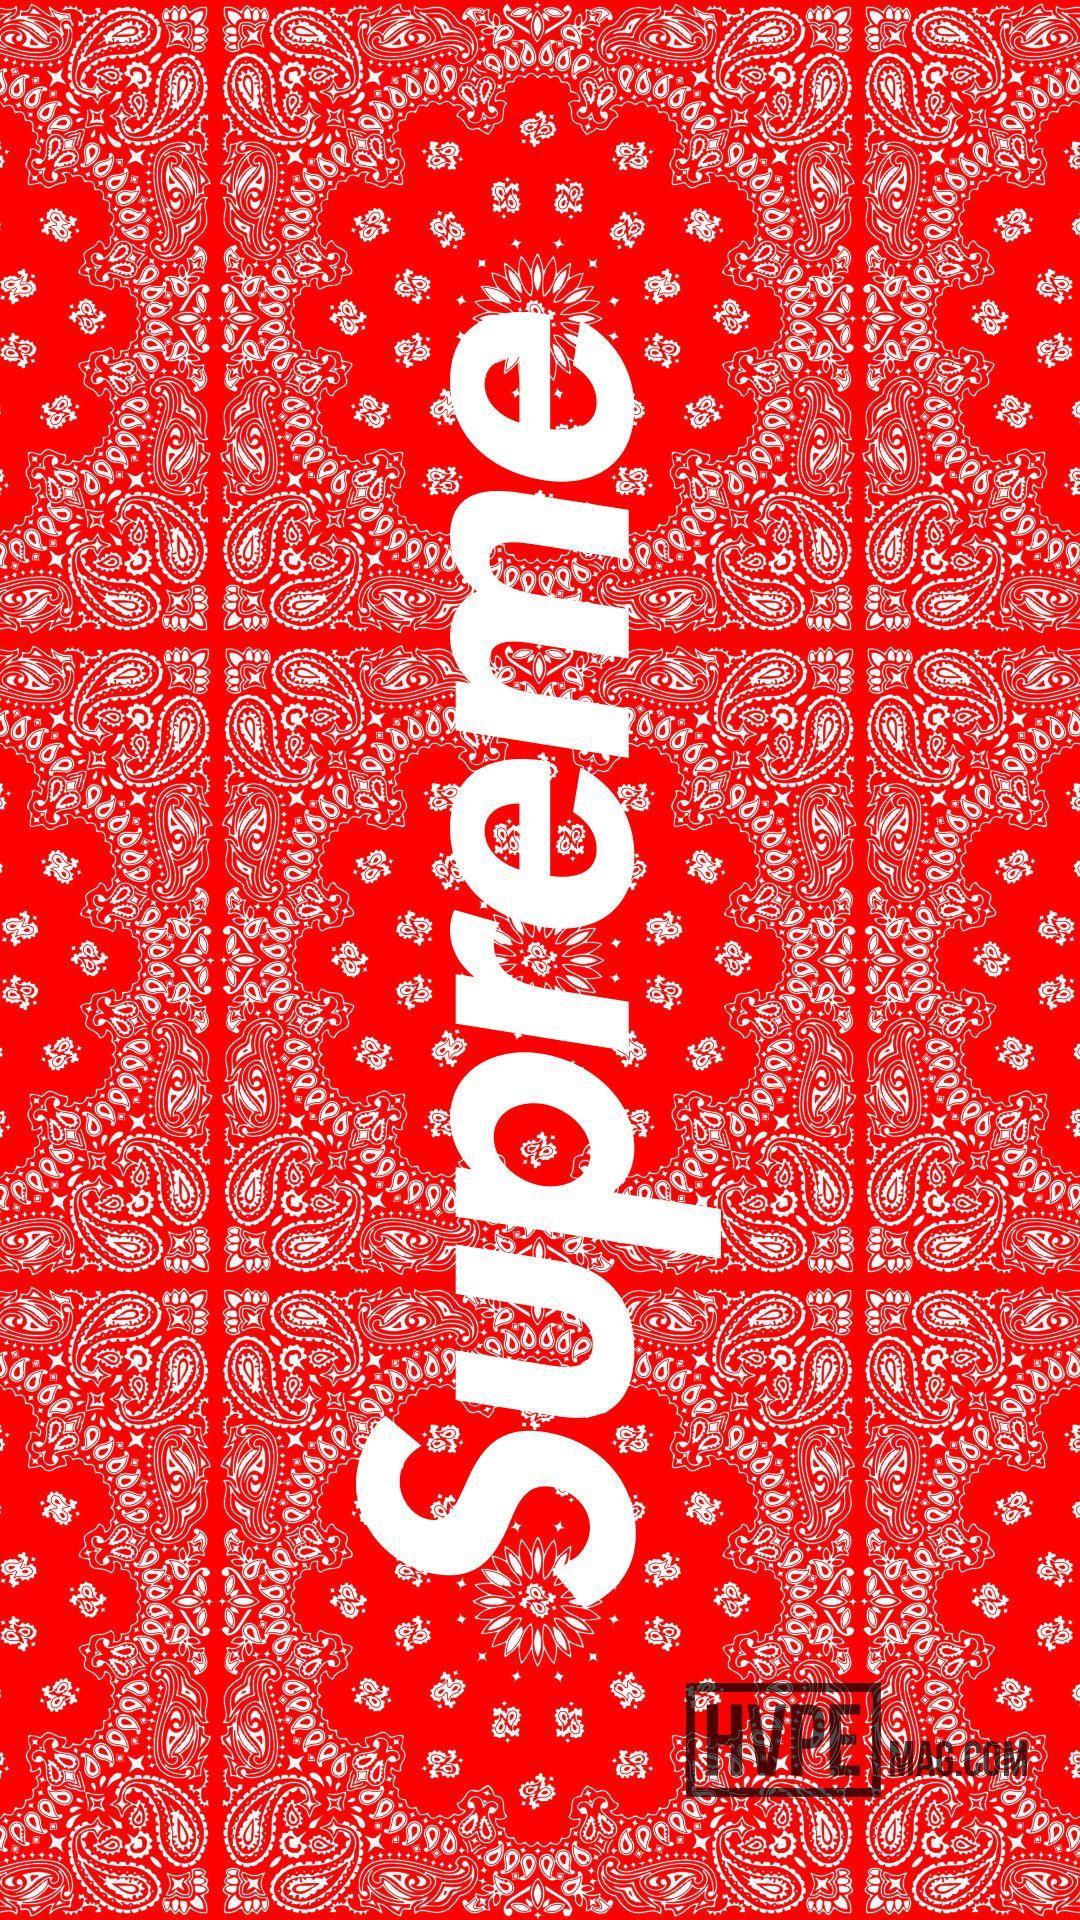 Red Bandana Wallpapers HD - Wallpaper Cave